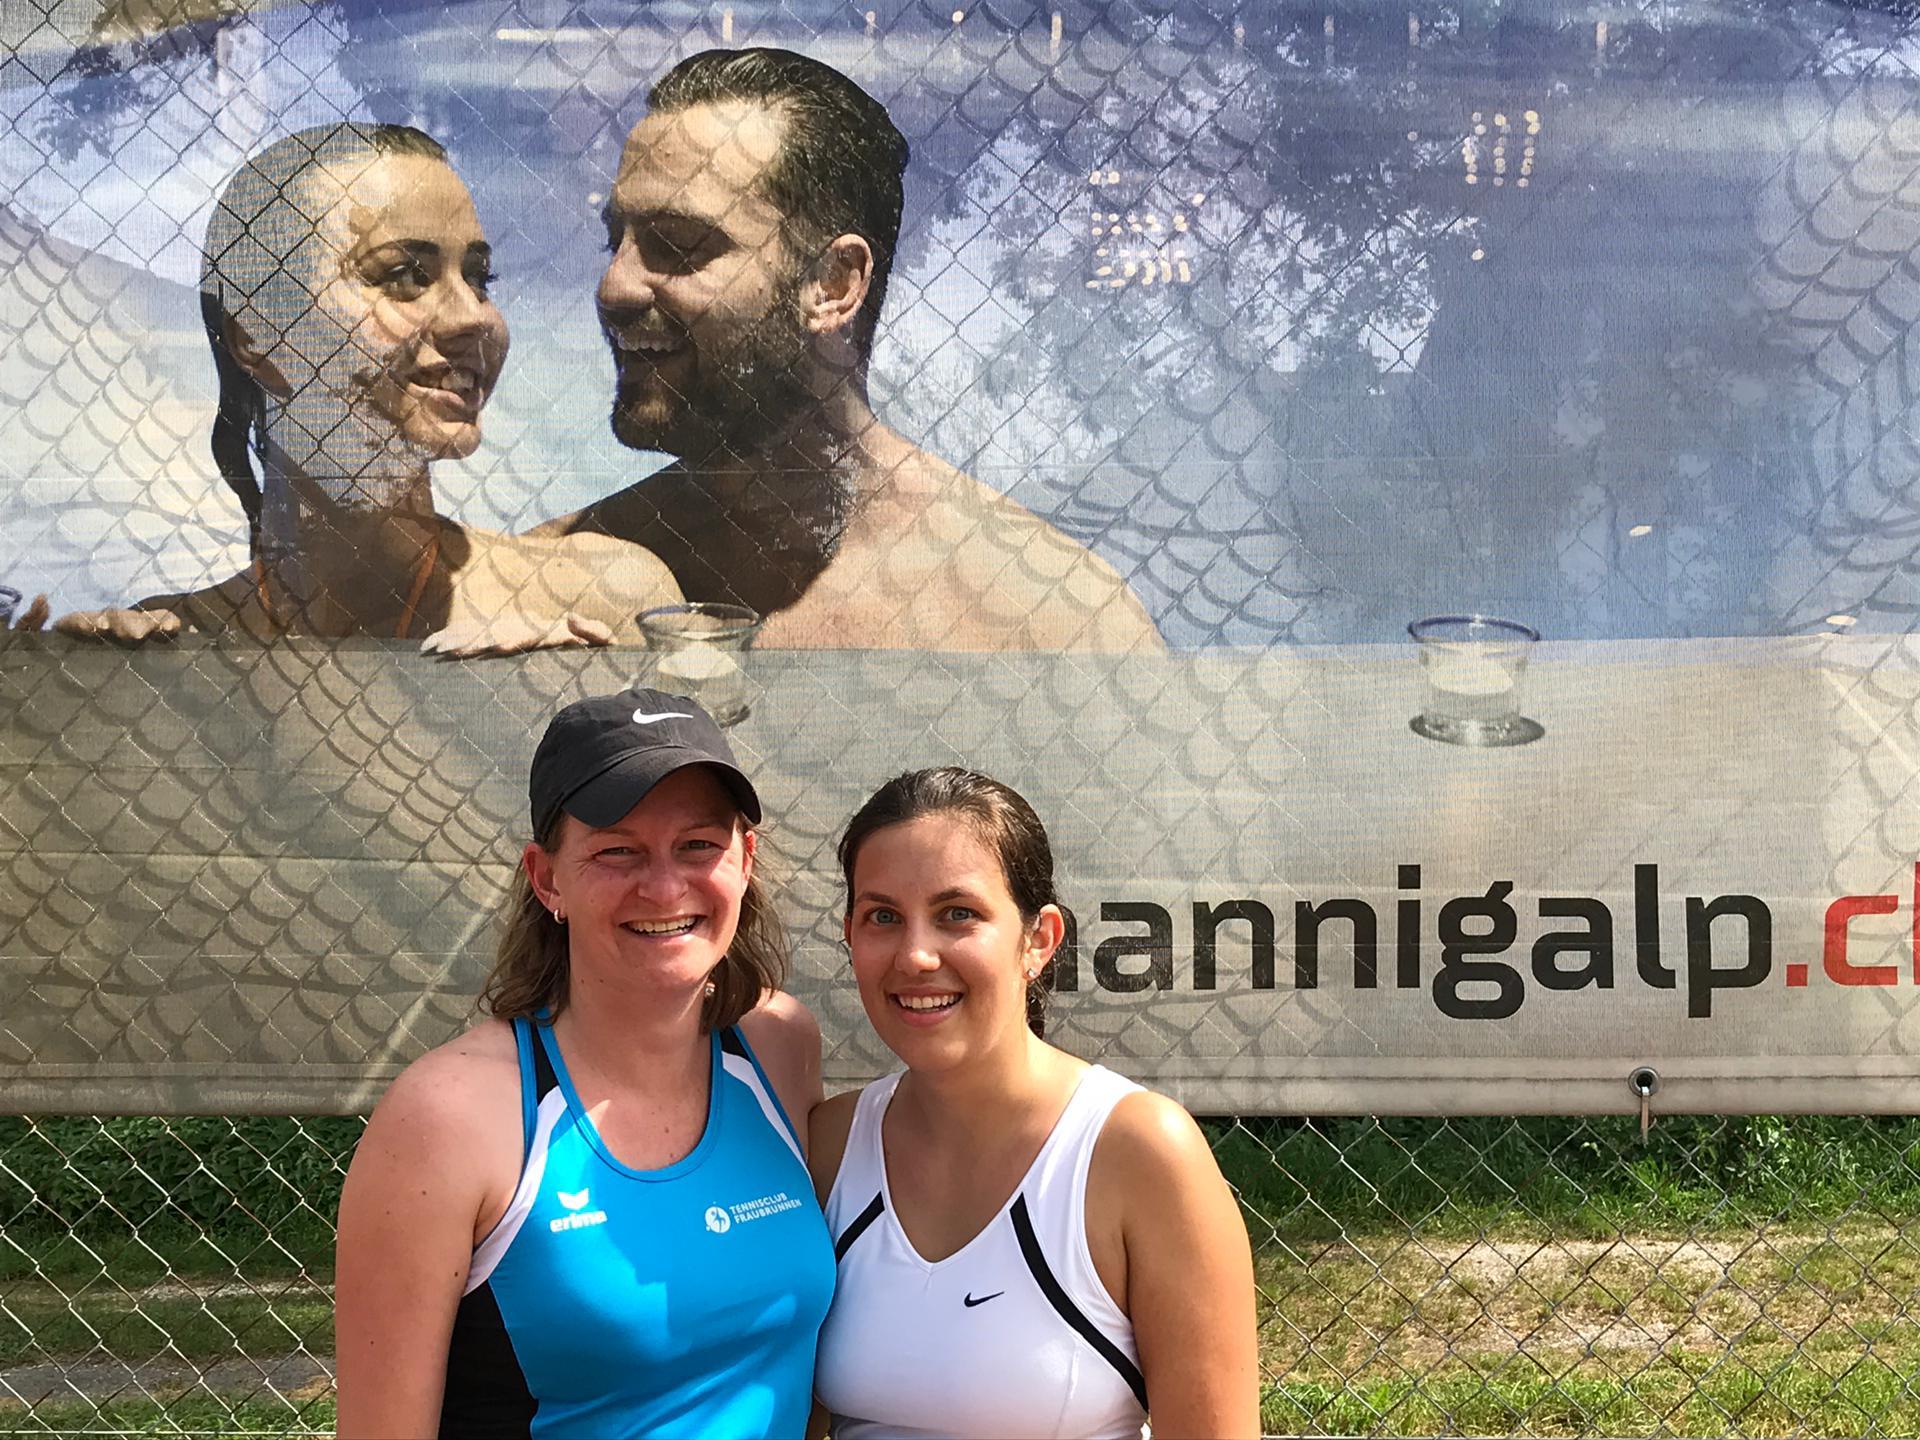 2019 Damen Trostturnier Sieger: Karen Tiemann / Finalistin: Tatjana Wingeier